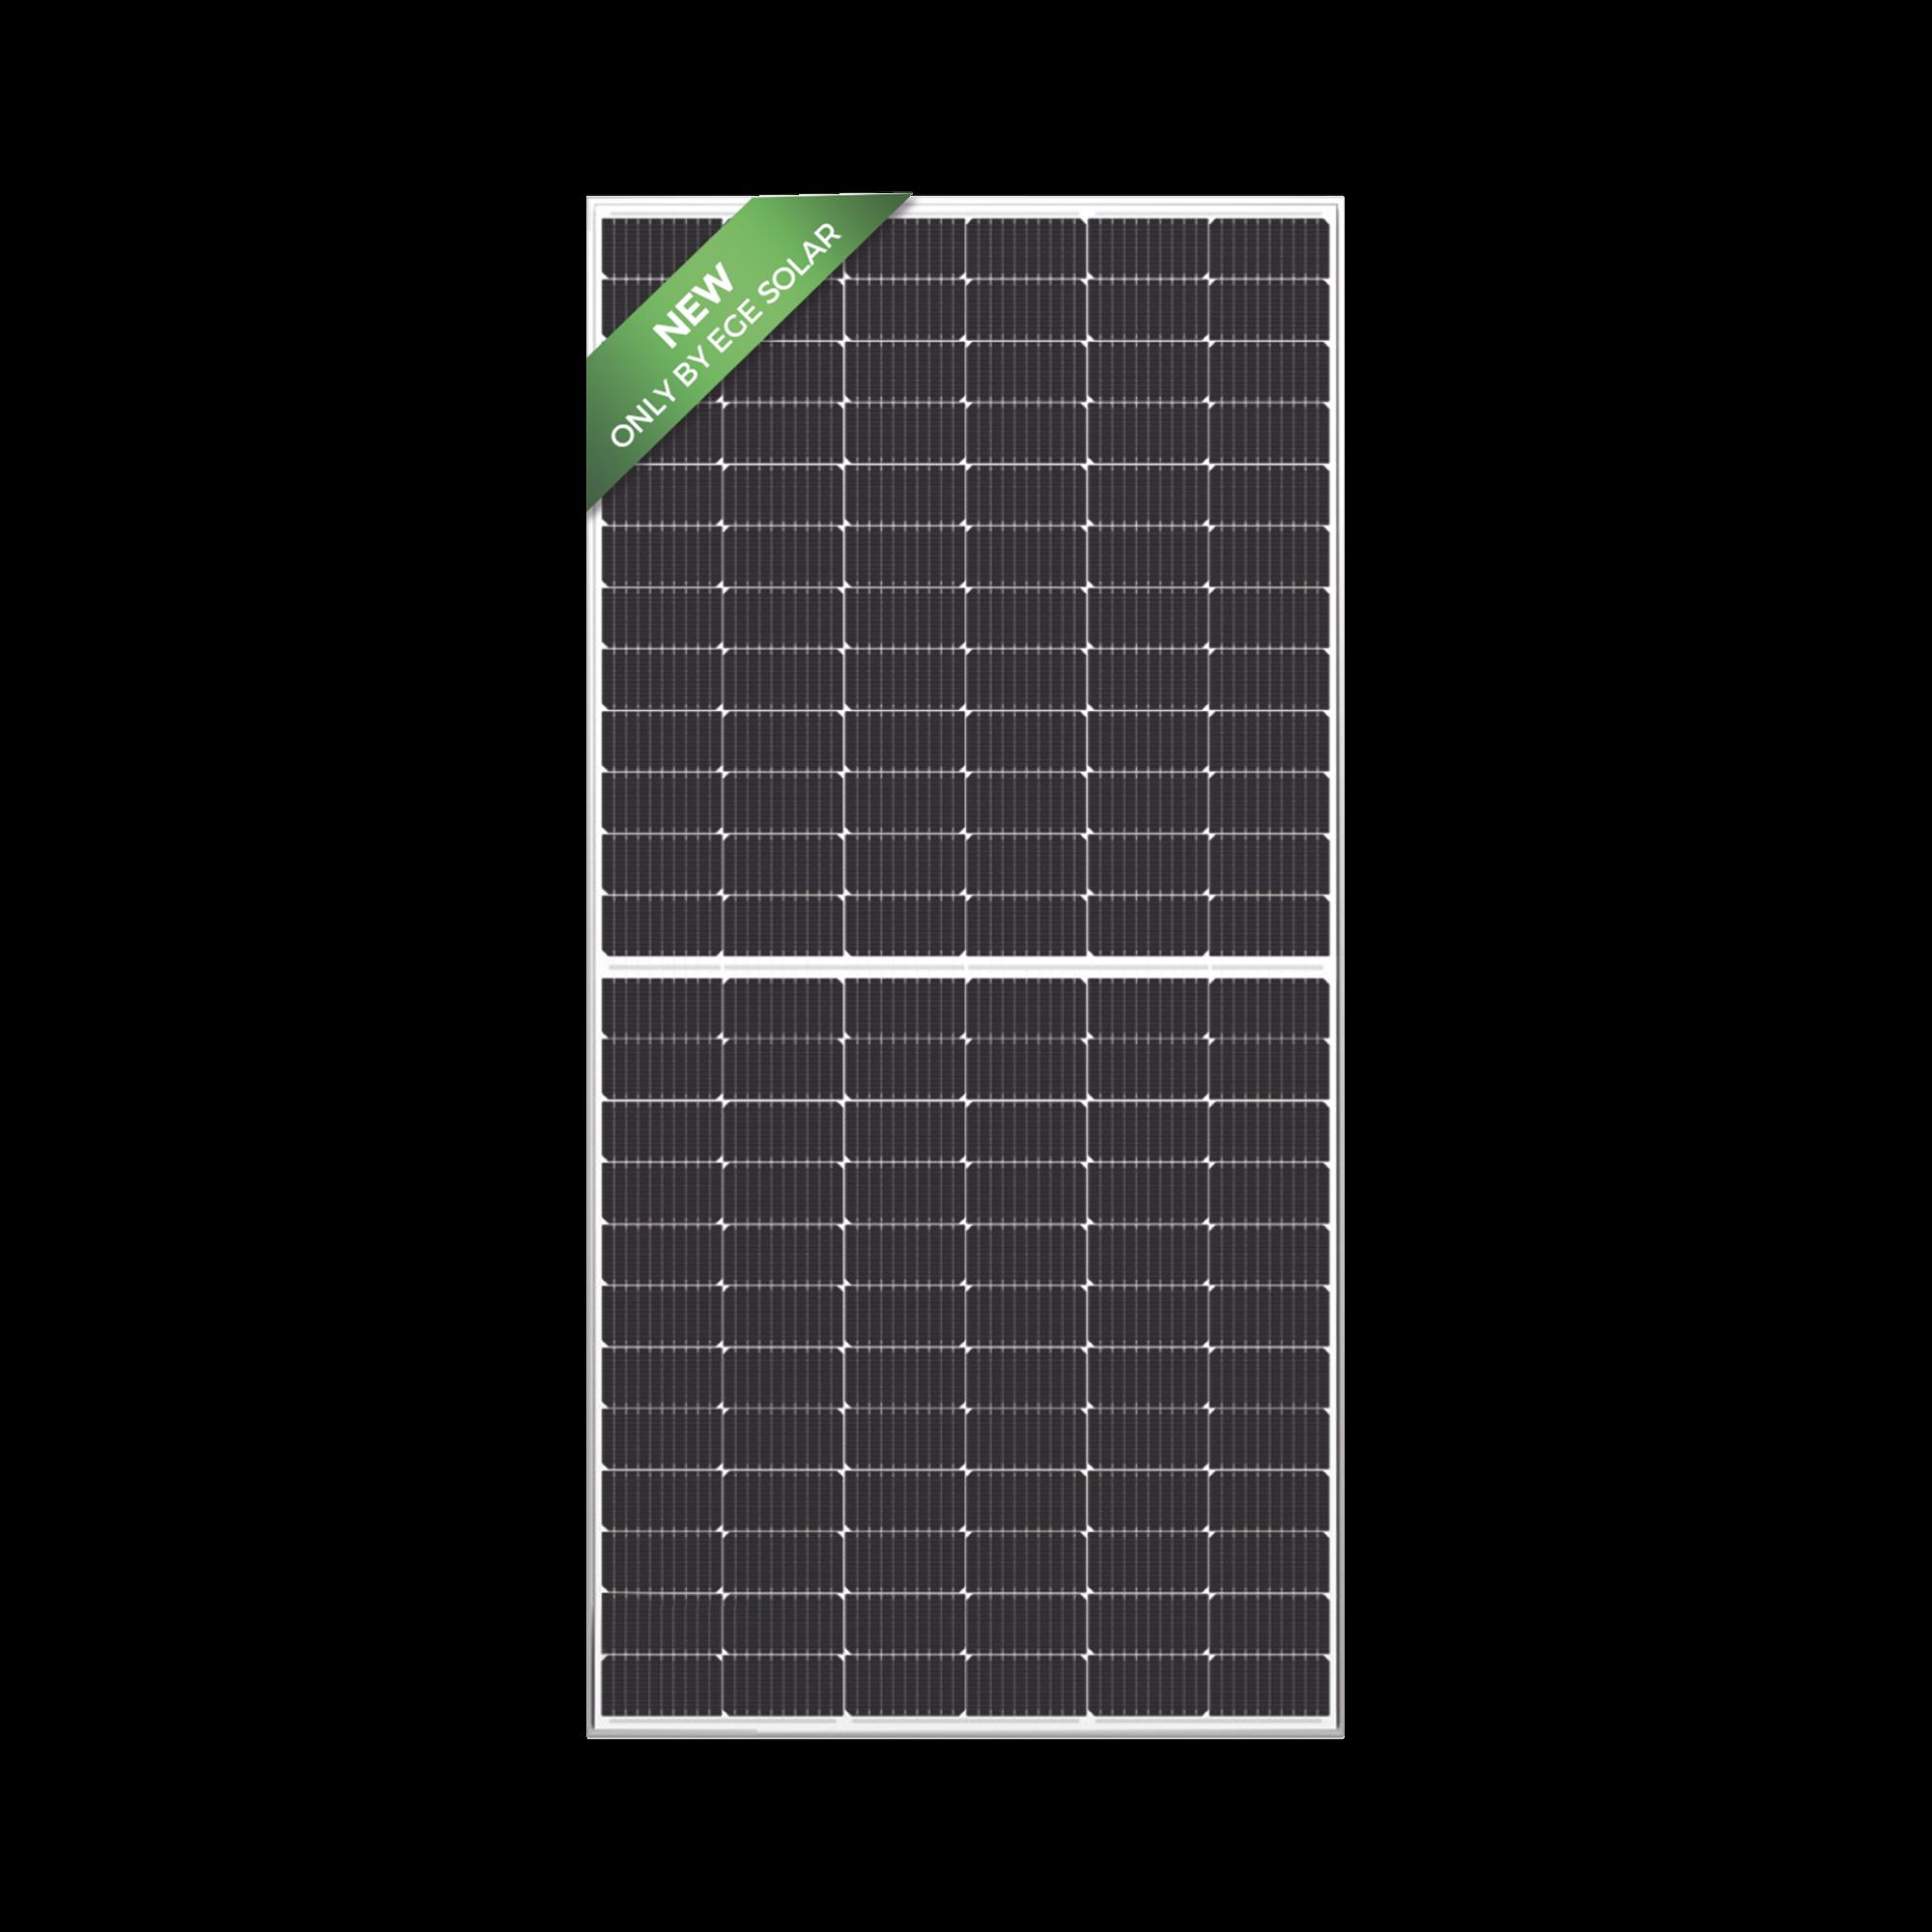 Modulo Fotovoltaico de 450 W Monocrsitalino de Celda Cortada Grado A PERC. 144 Celdas, Vidrio Templado de 3.2 mm